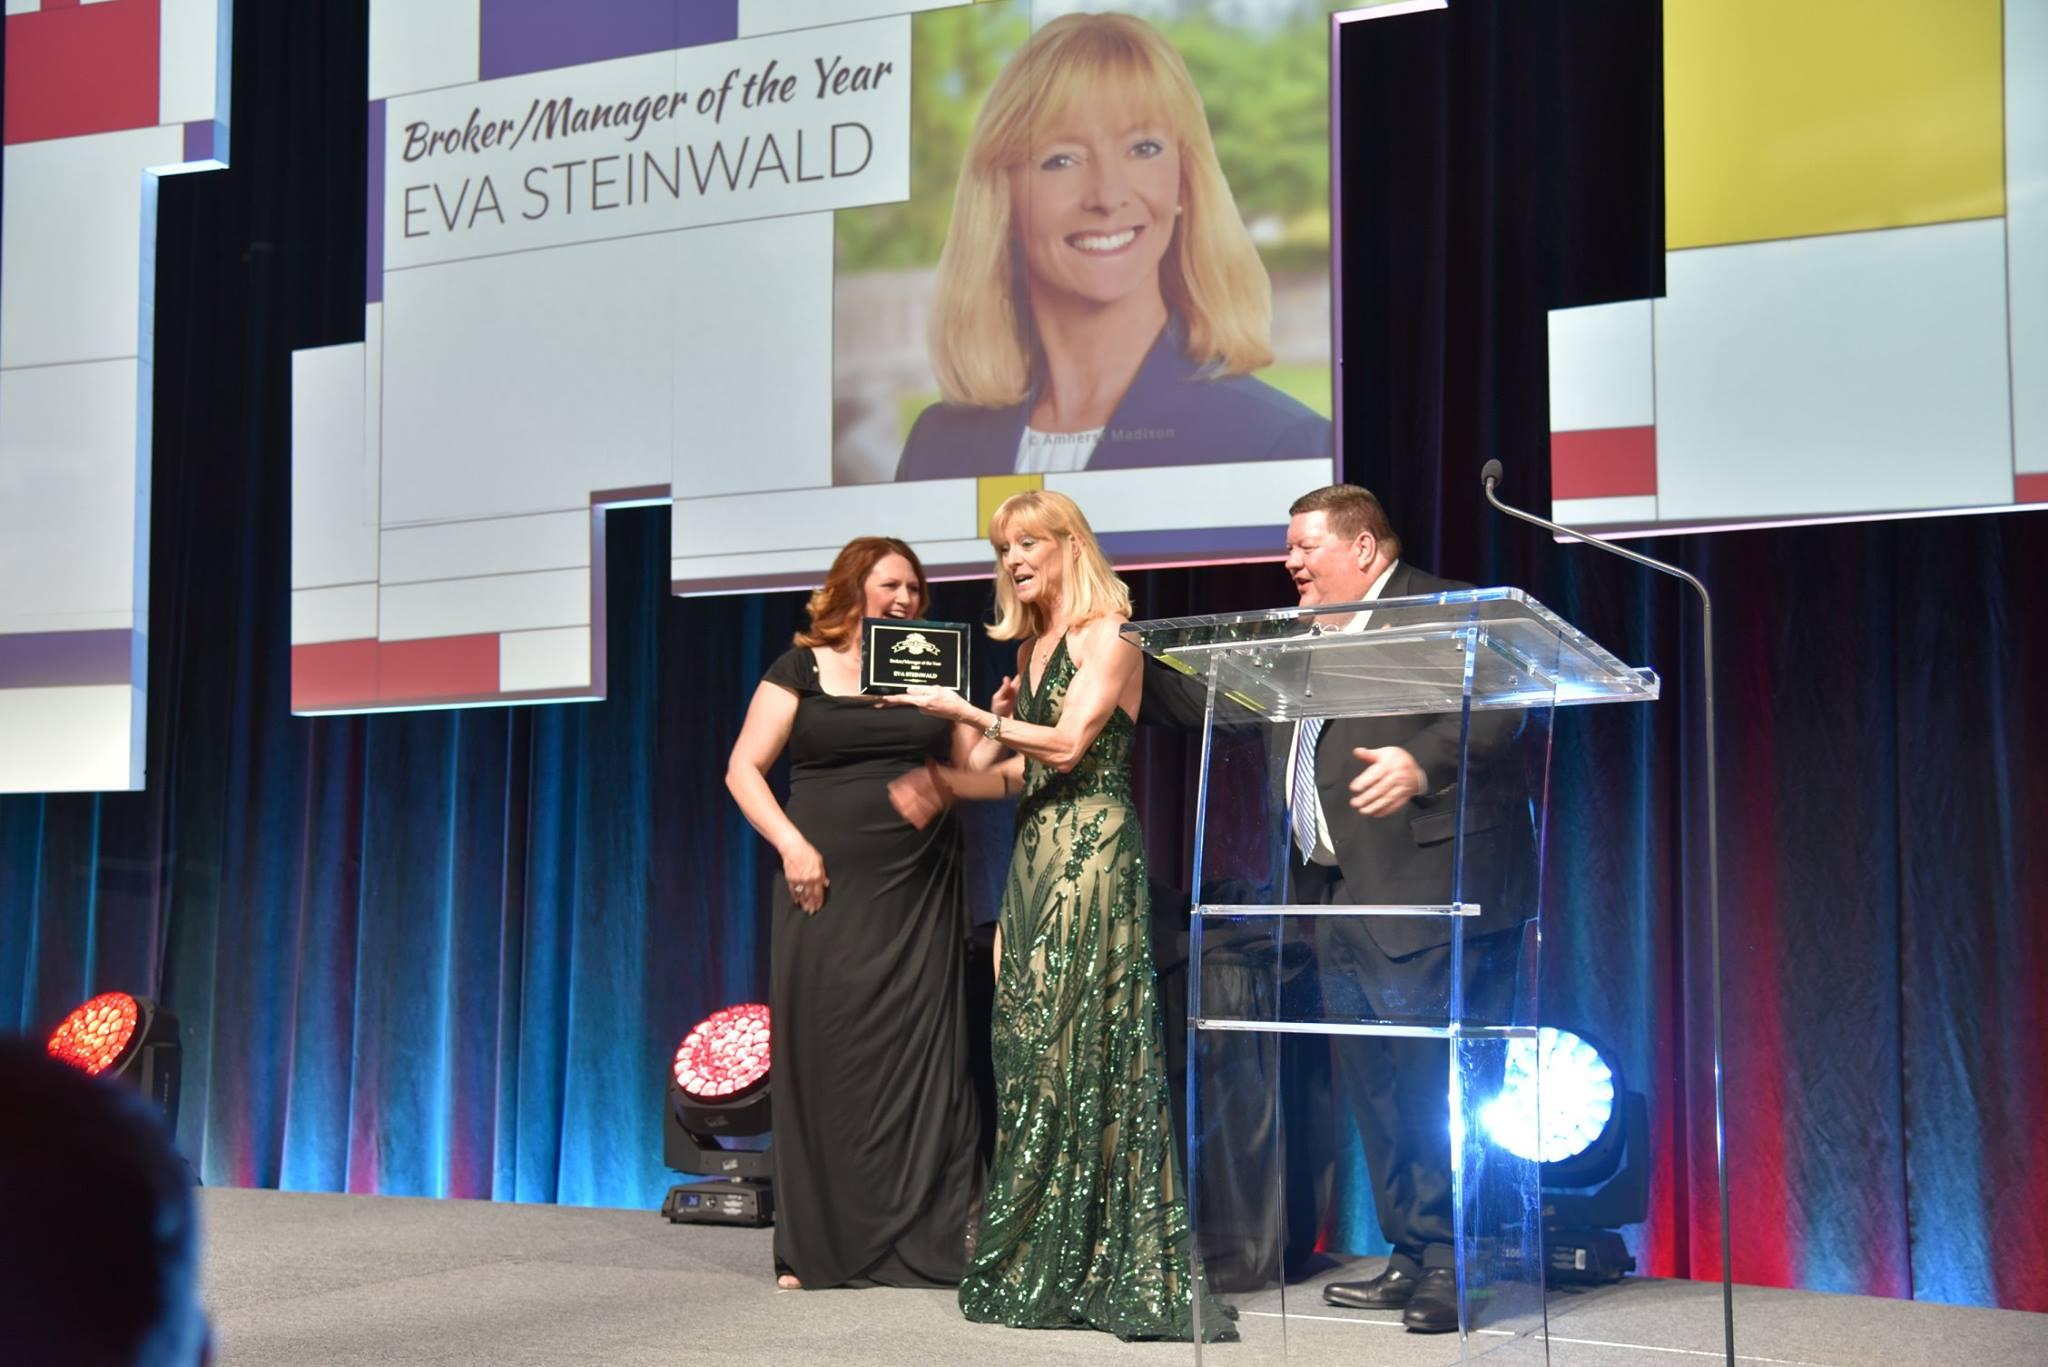 Eva Steinwald Receiving Broker of the Year Award